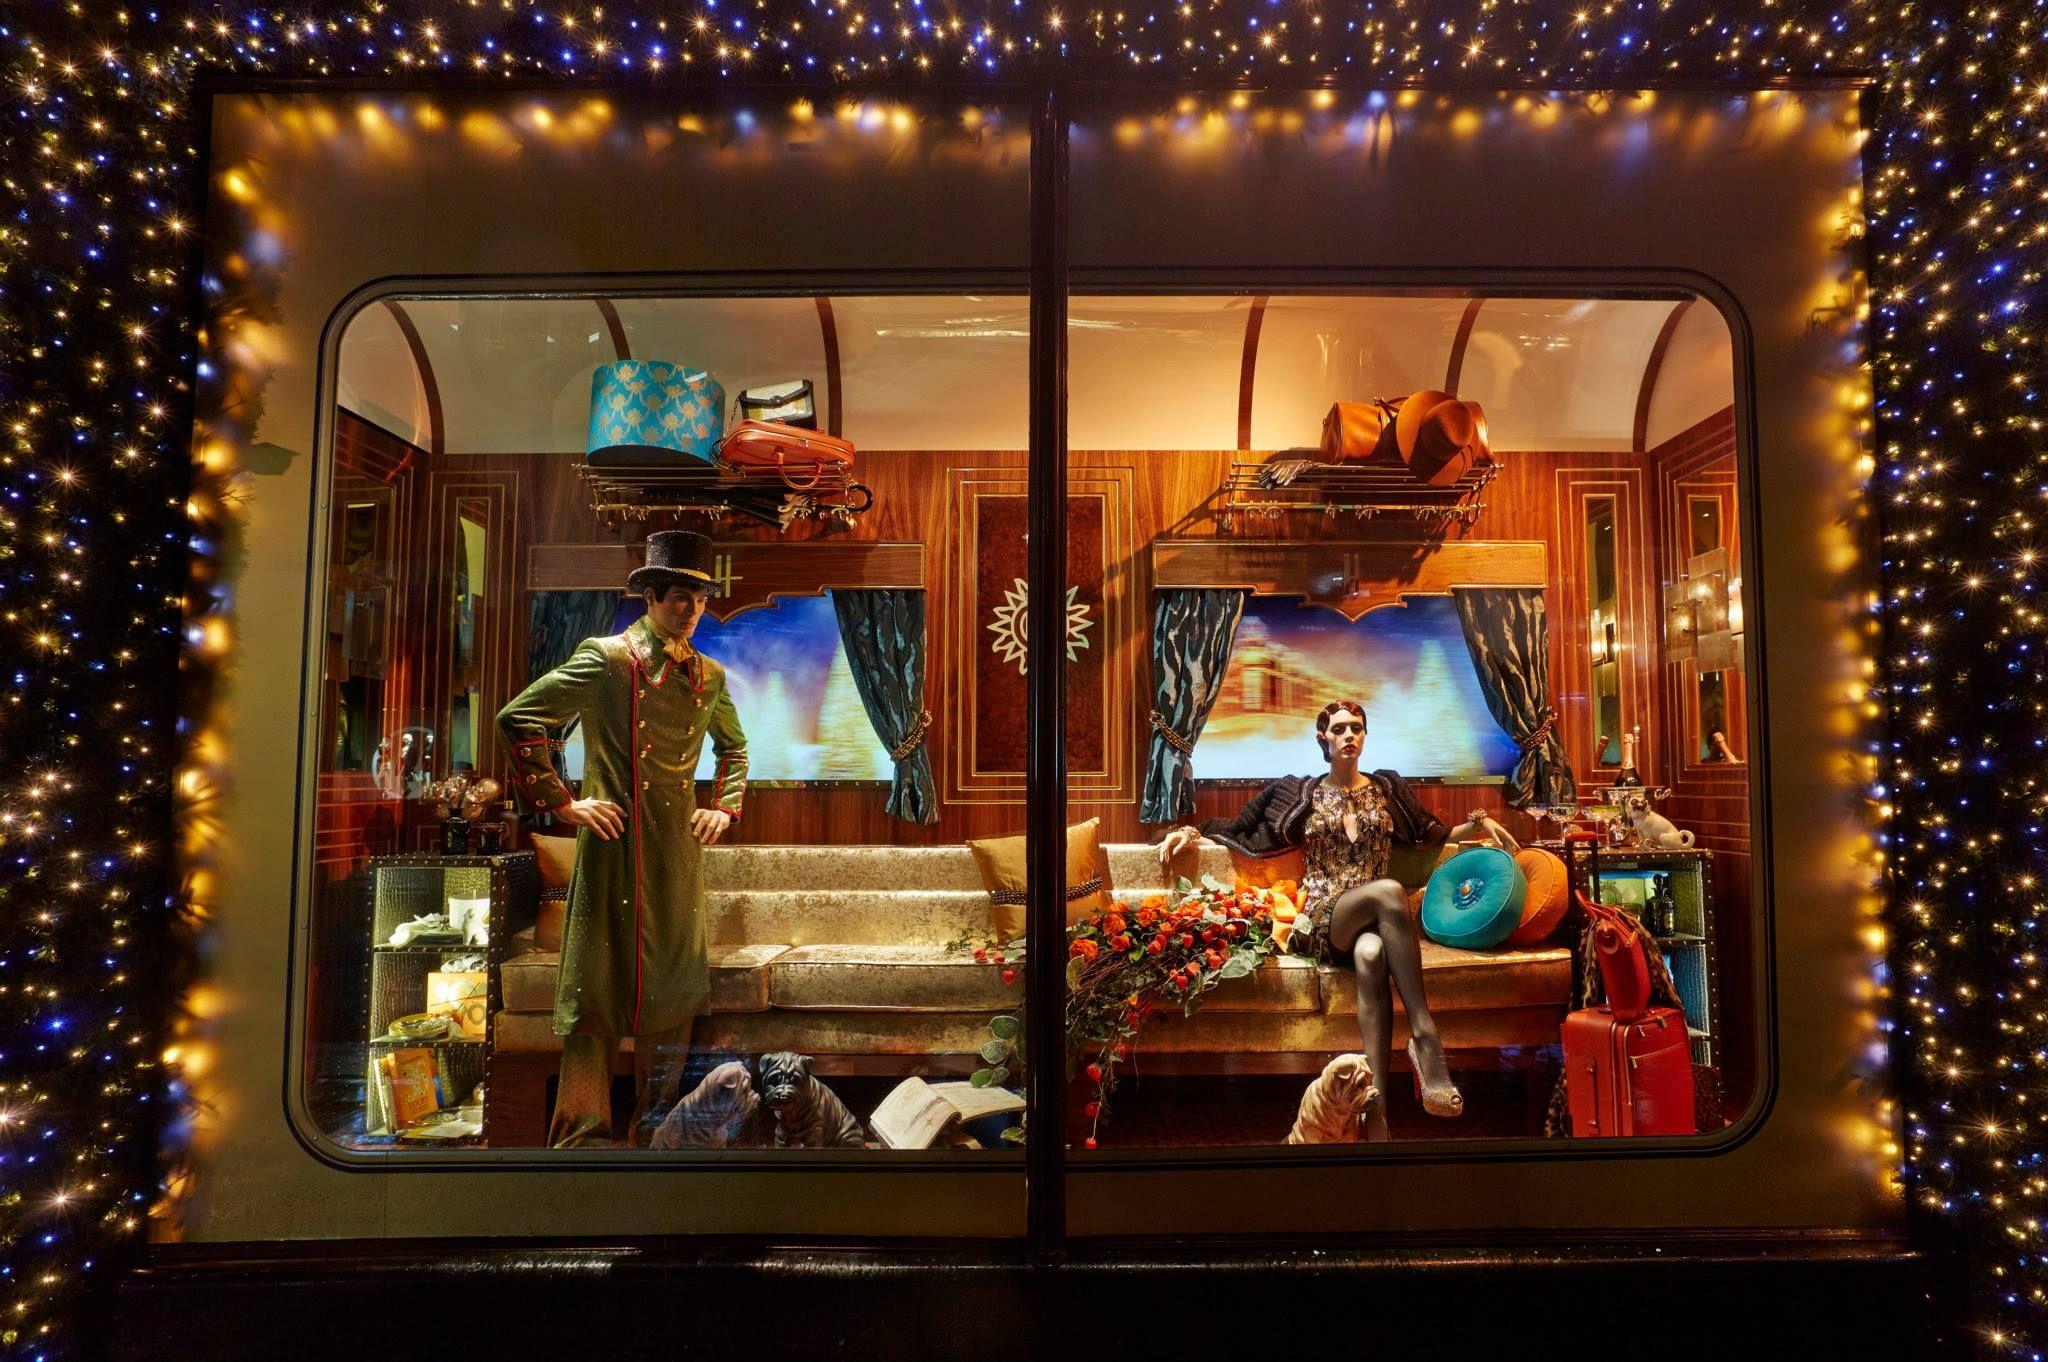 harrods christmas decorations